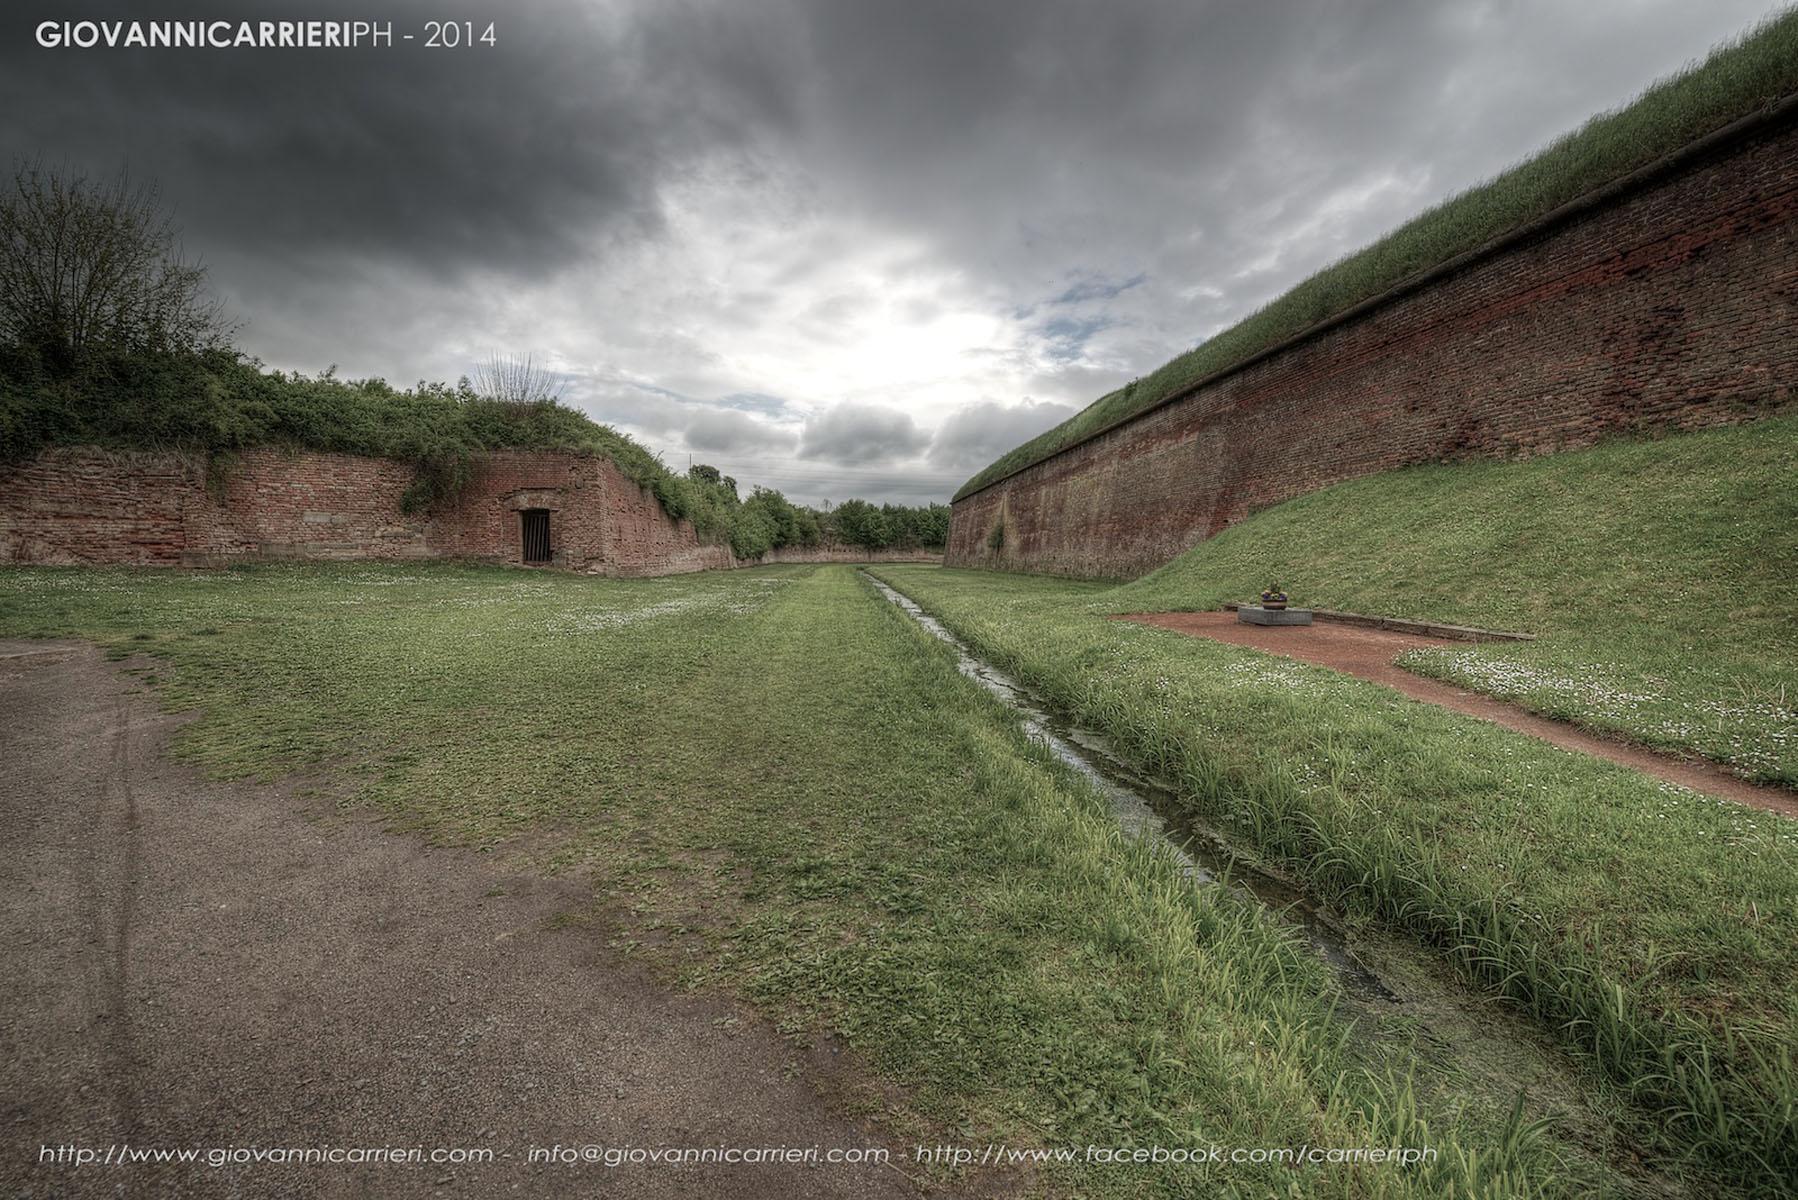 La grande fossa comune - Theresienstadt